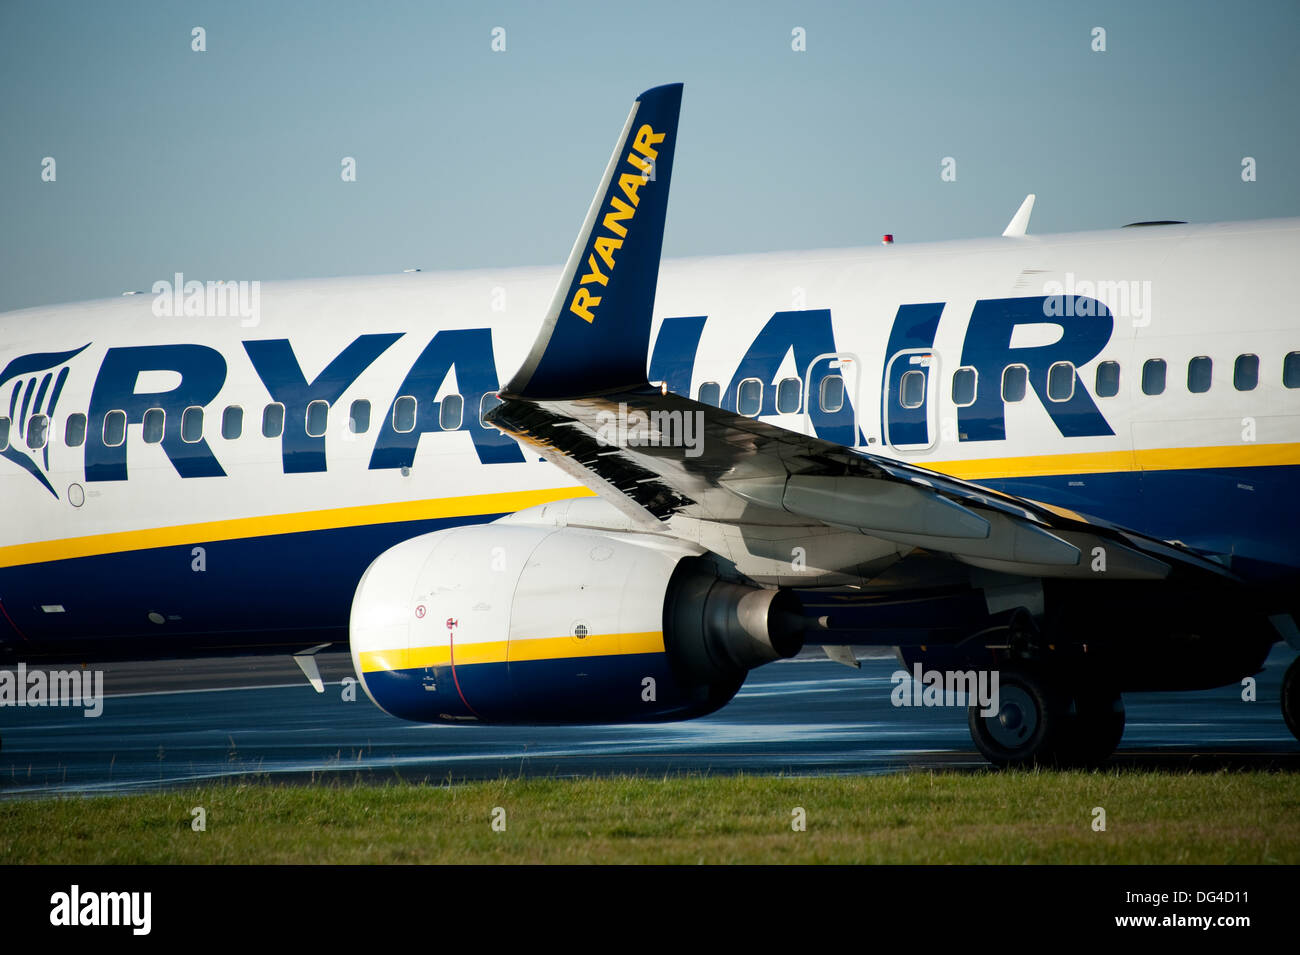 Ryanair Jet Plane on runway - Stock Image